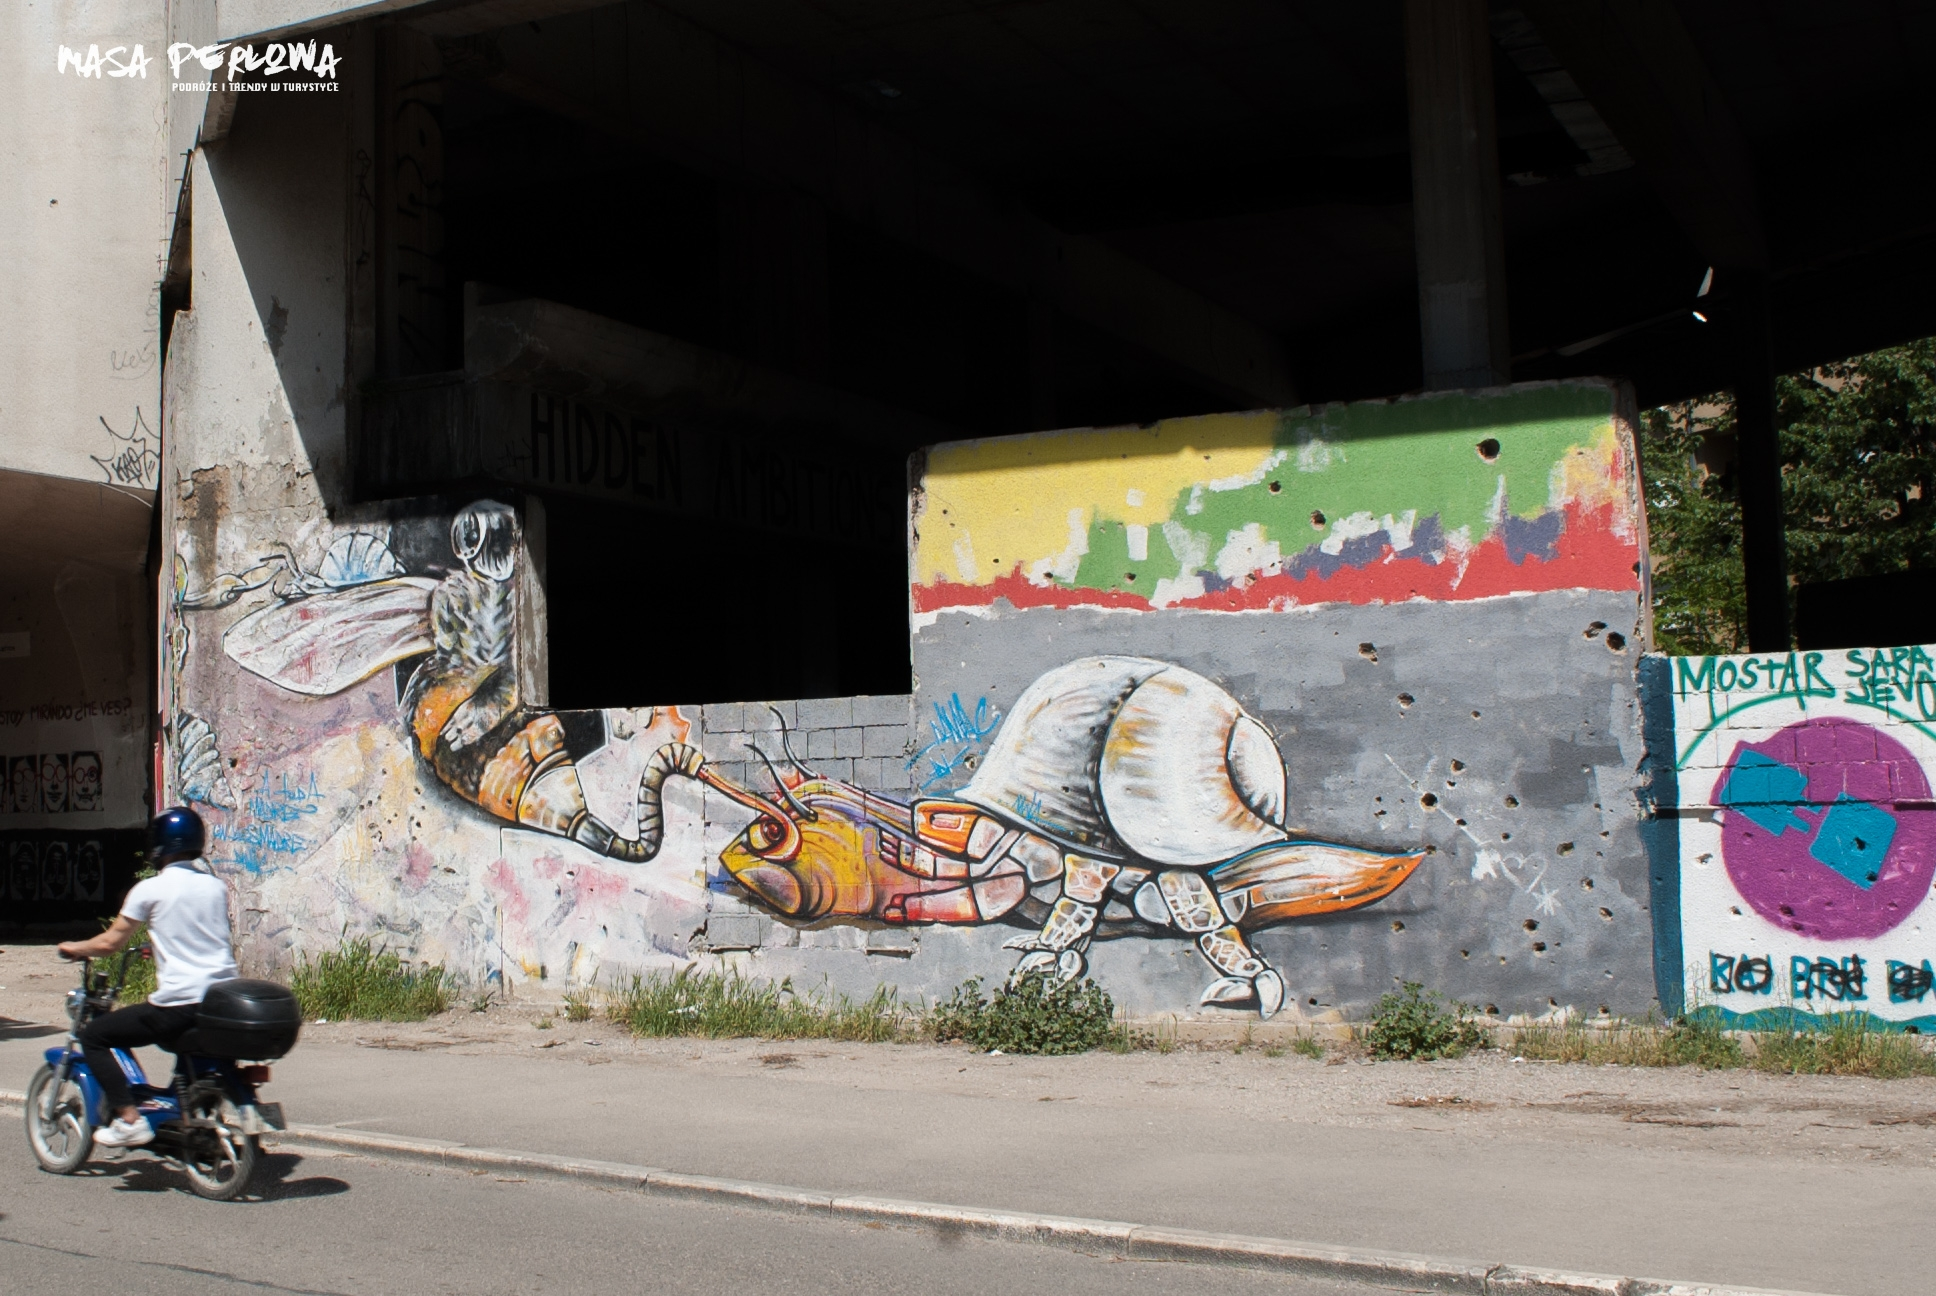 Mostar mural Wieża Snajpera